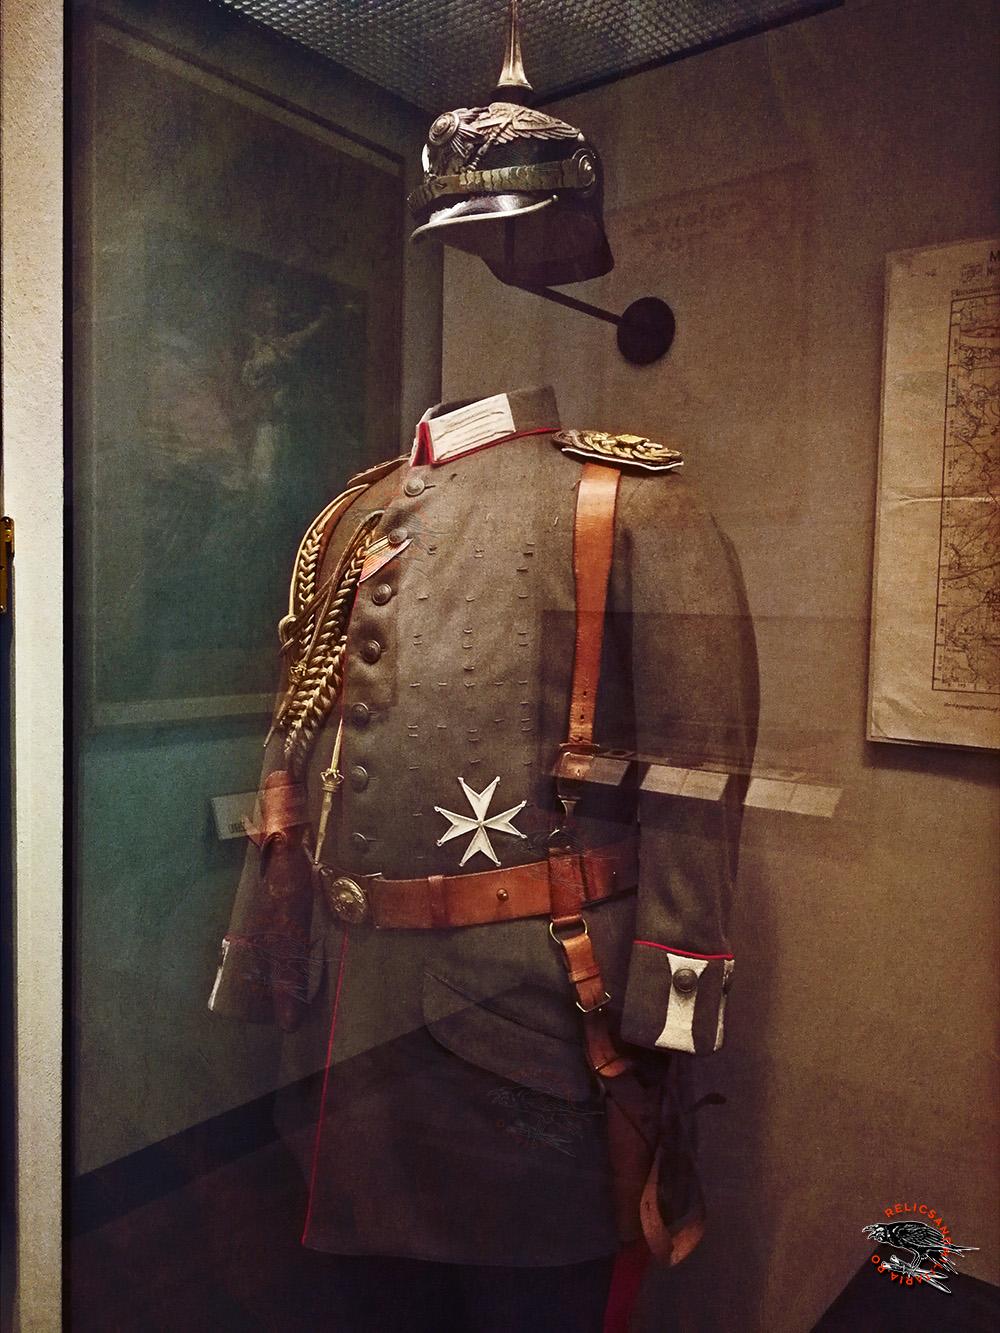 German ww1 uniform